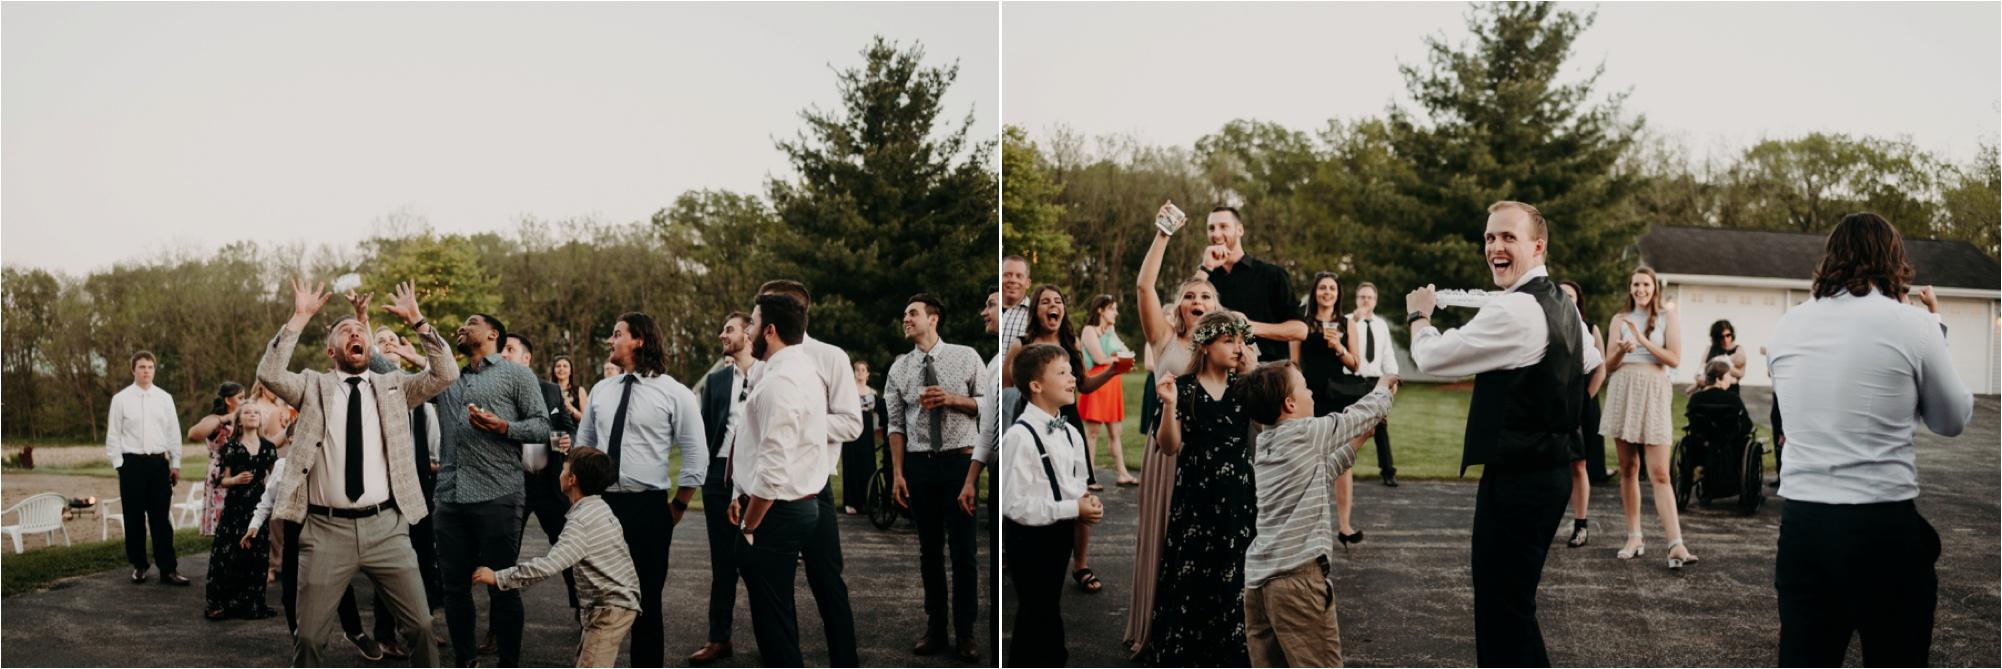 The Barn and Black Ridge Wedding Minneapolis Wedding Photographer_4182.jpg